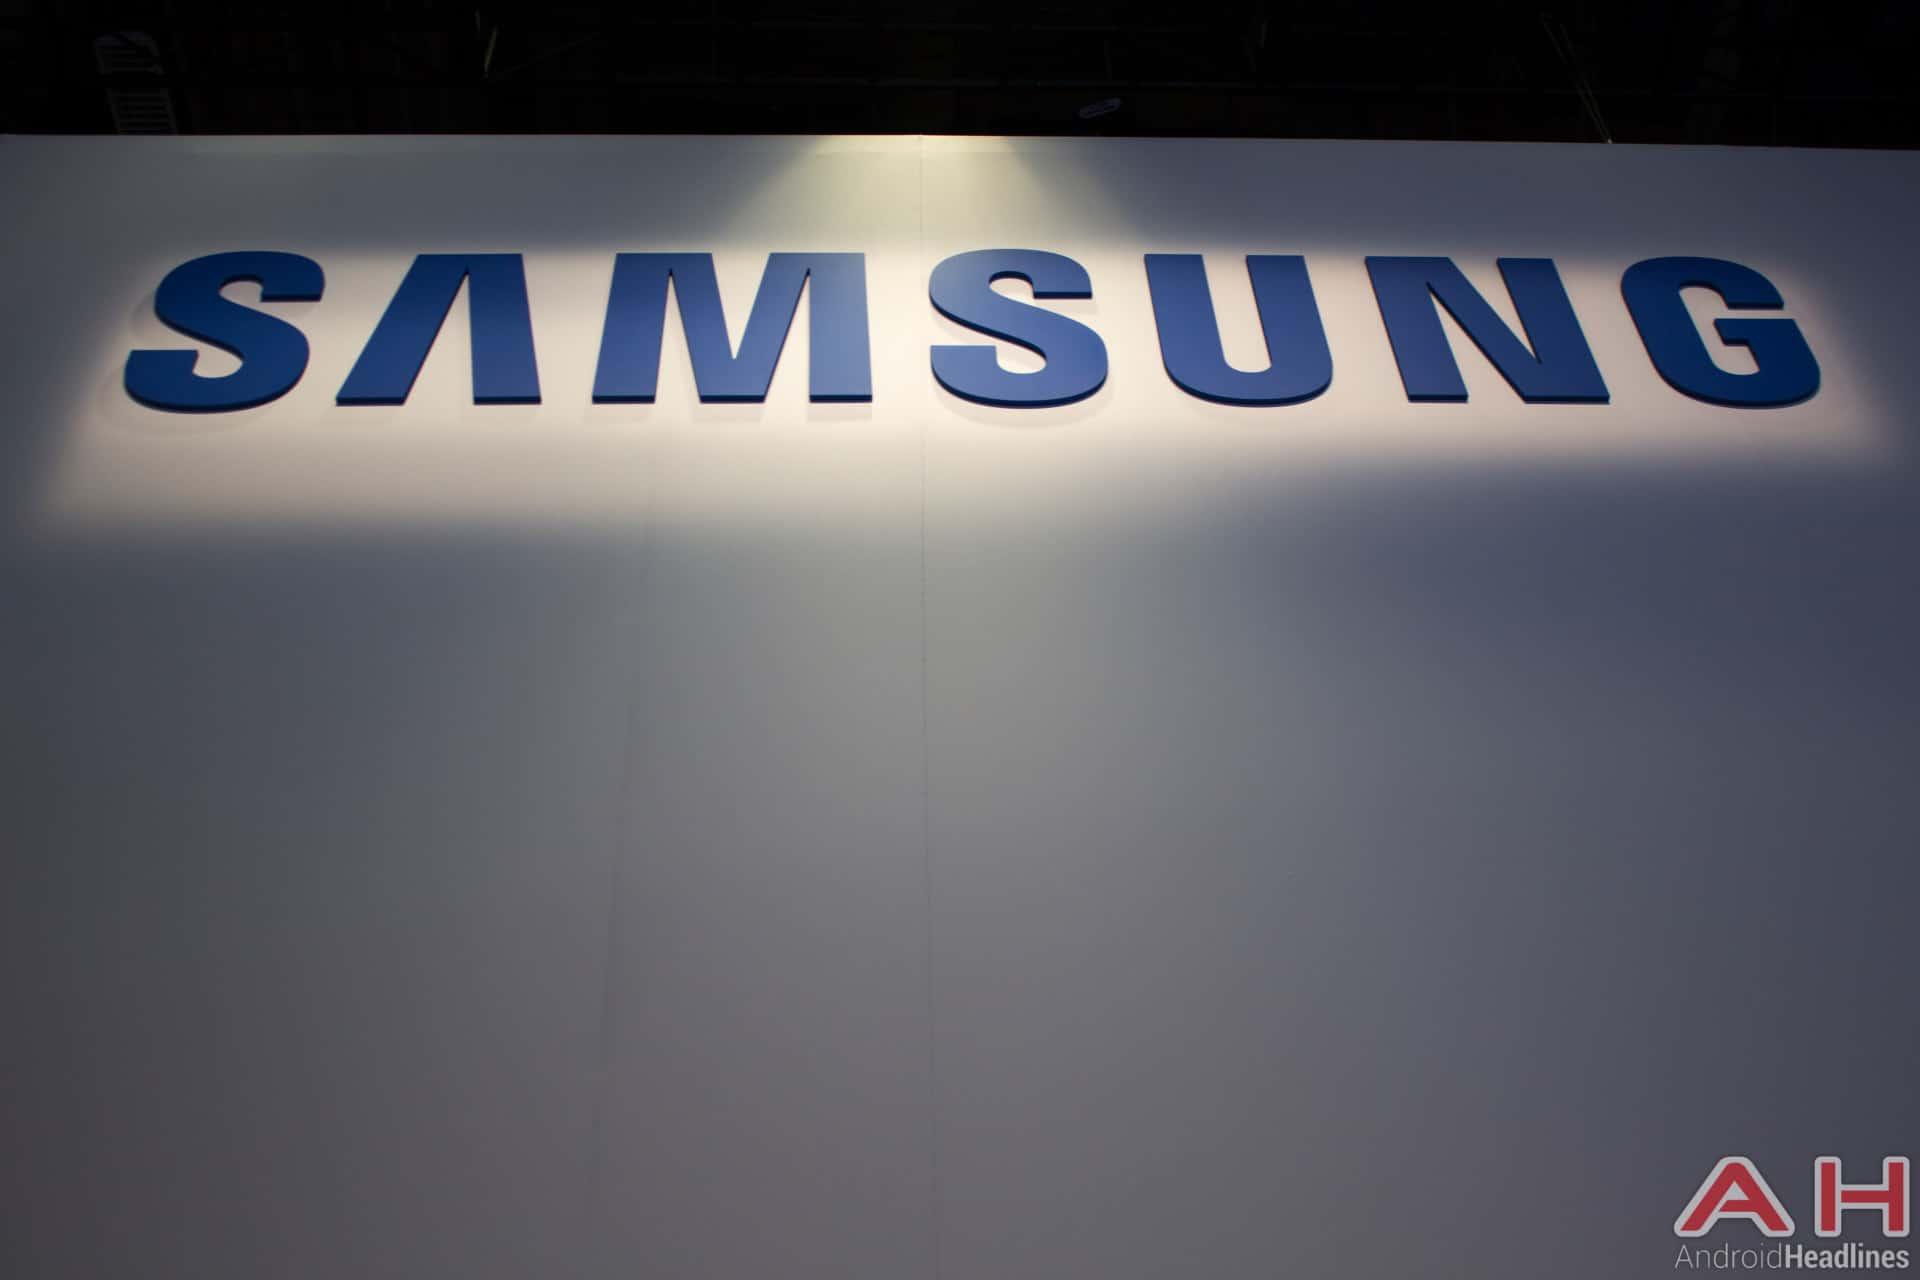 Samsung Logo 2016 AH (12)